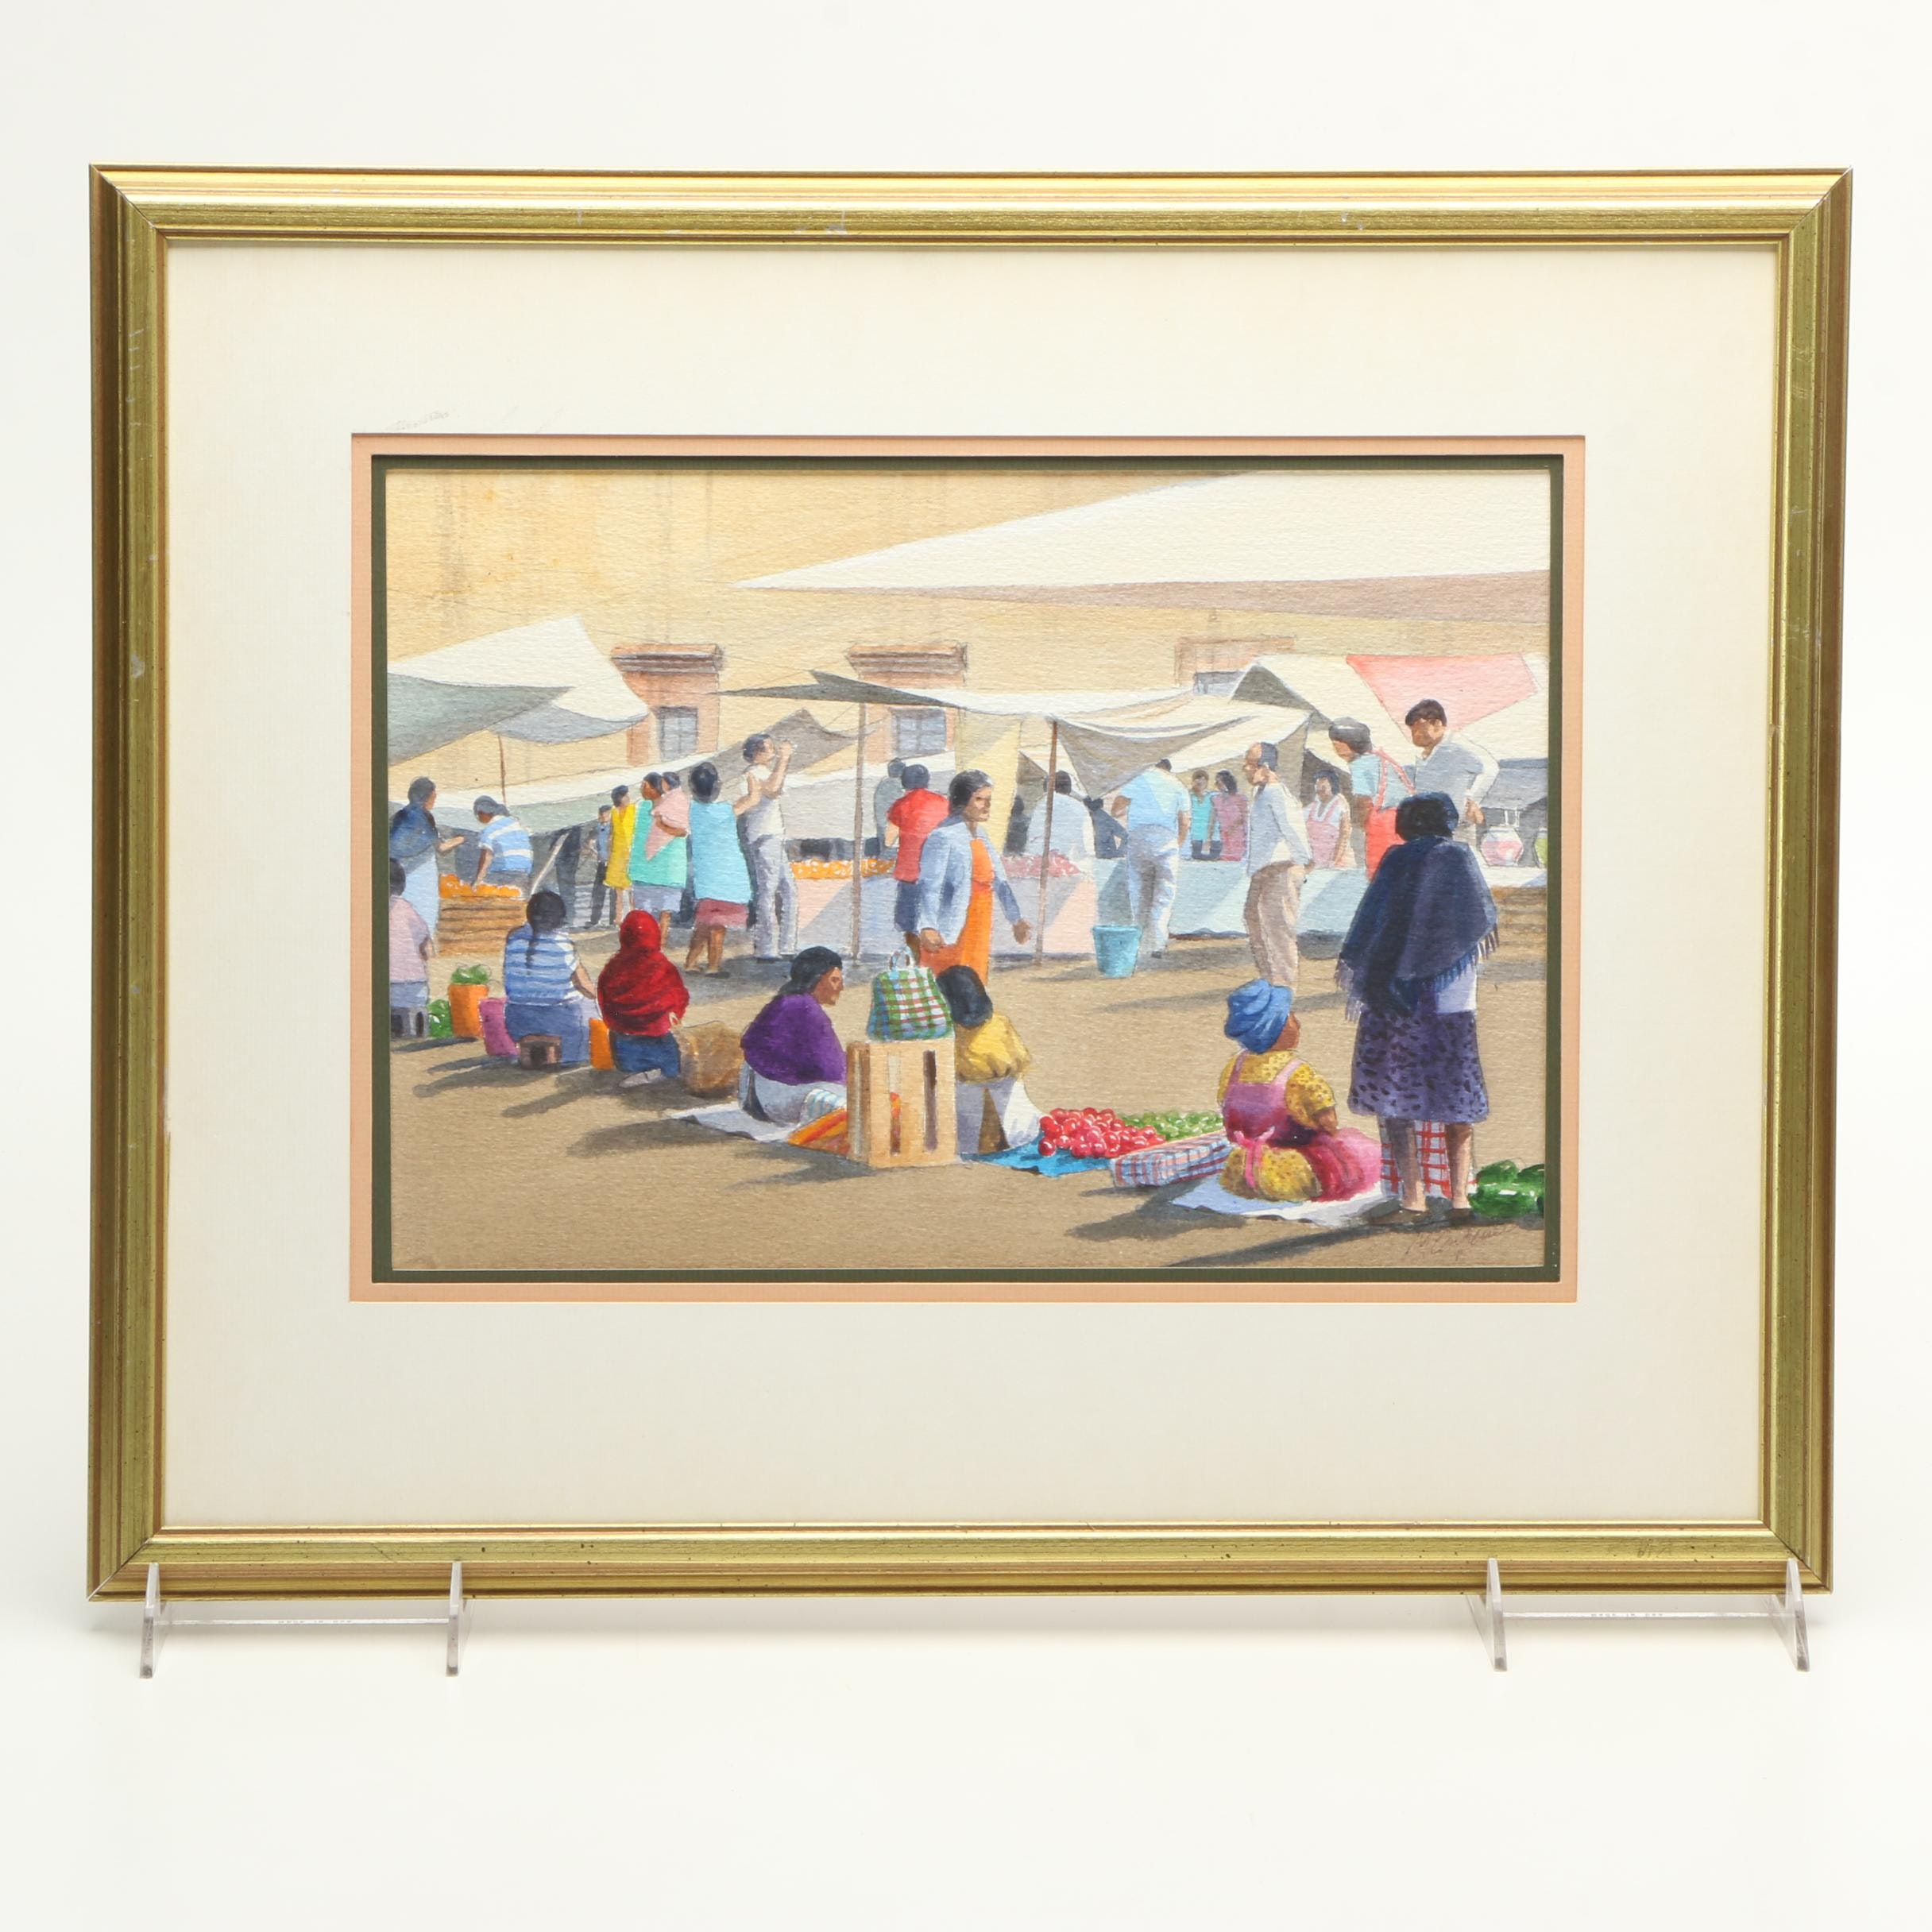 M. Carpenter Watercolor Painting of Market Scene